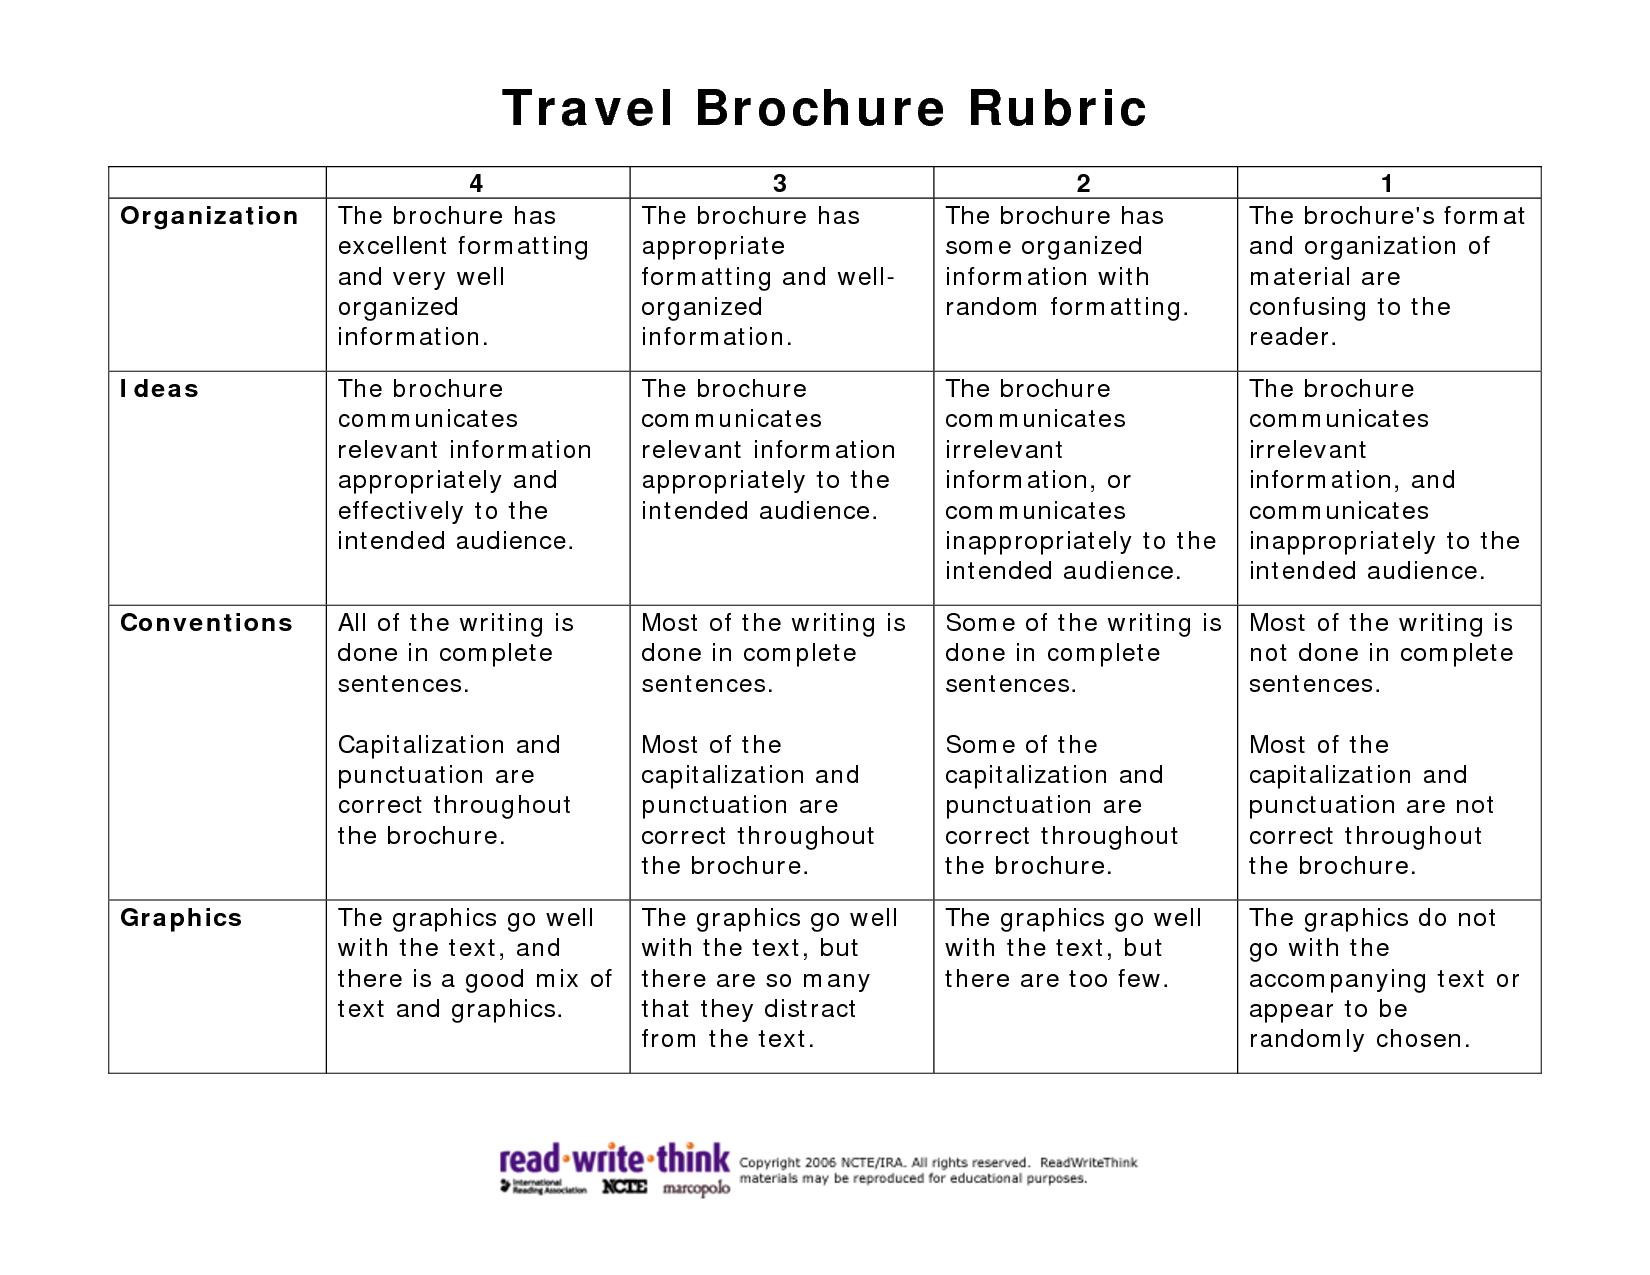 Travel Brochure Rubric Pdf Picture  Teaching  Travel Brochure For Brochure Rubric Template